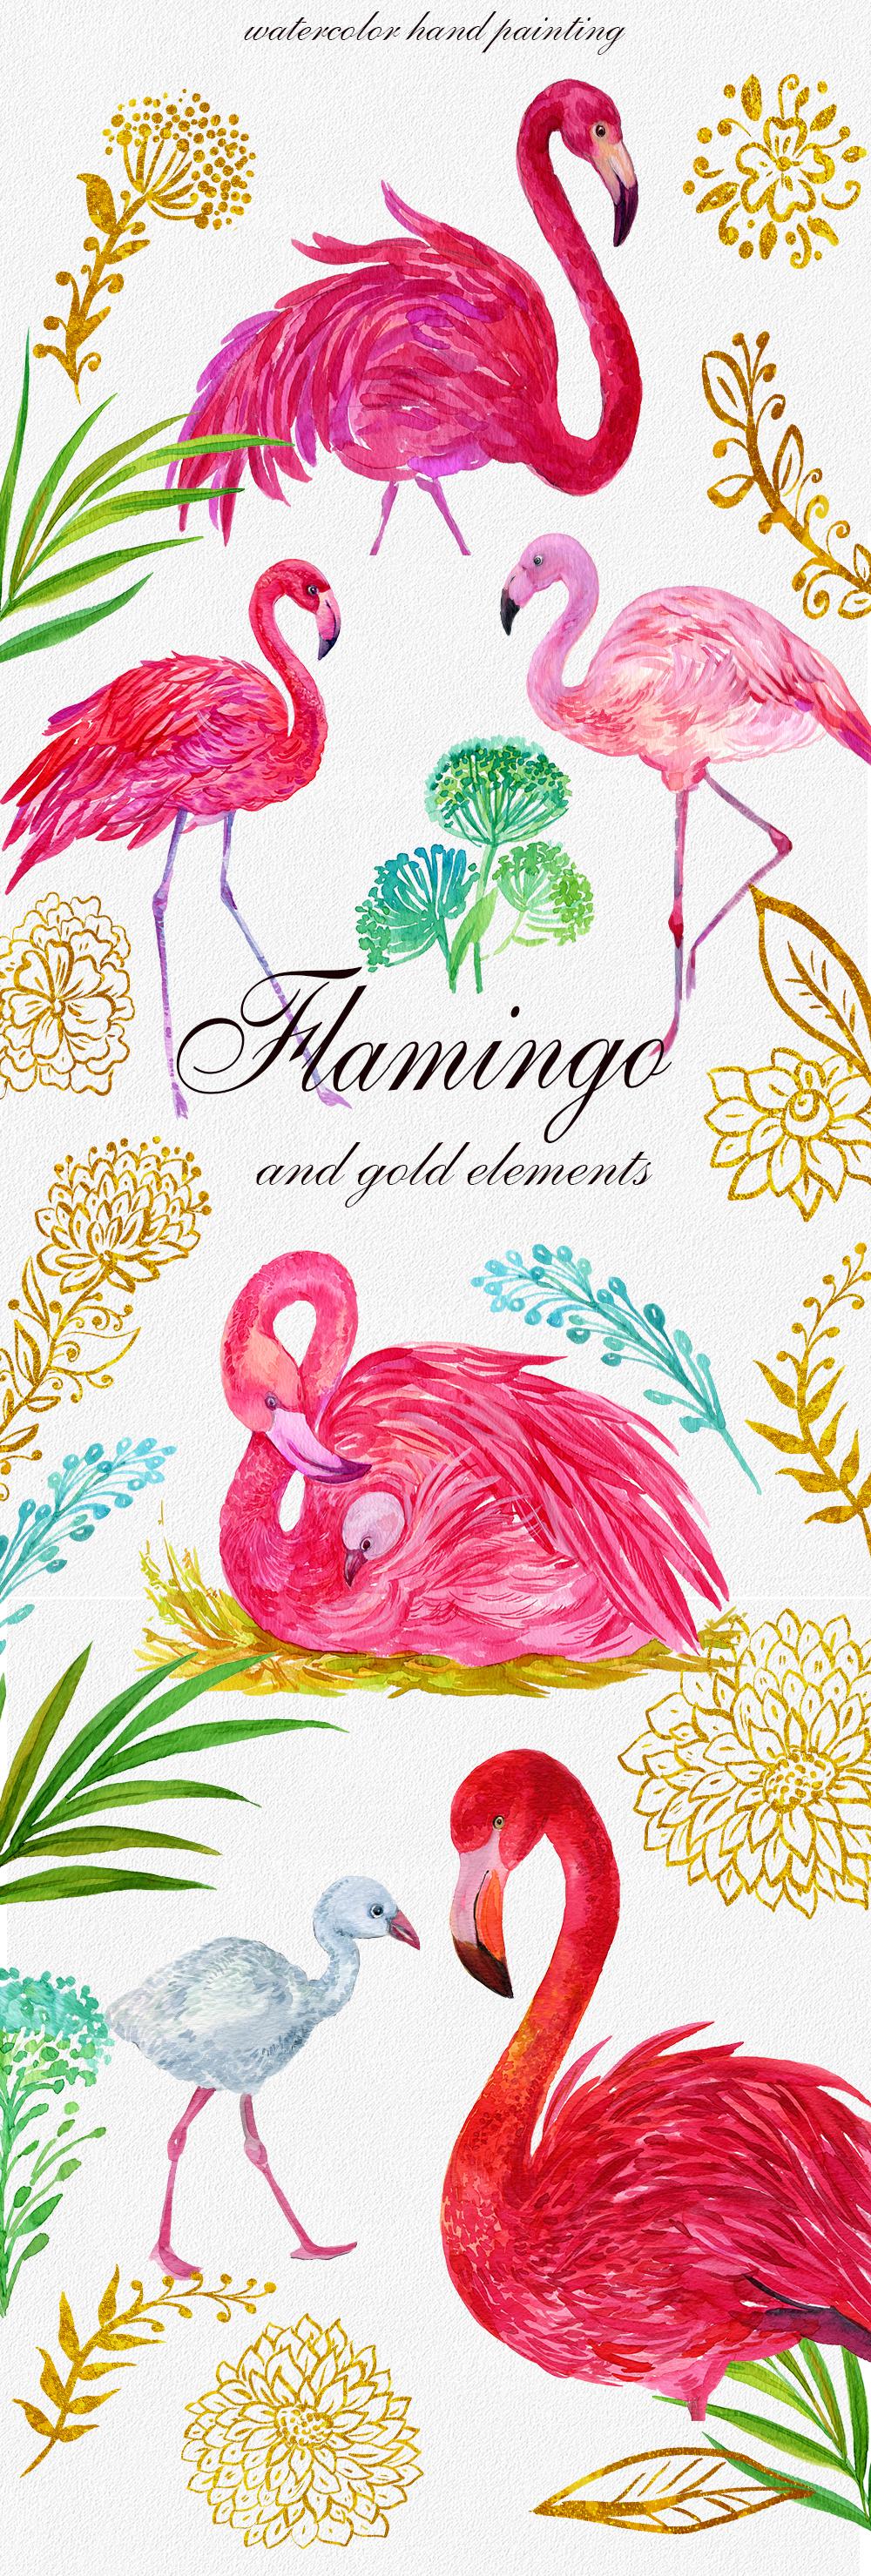 Flamingo.birds clipart. Watercolor Illustration example image 2